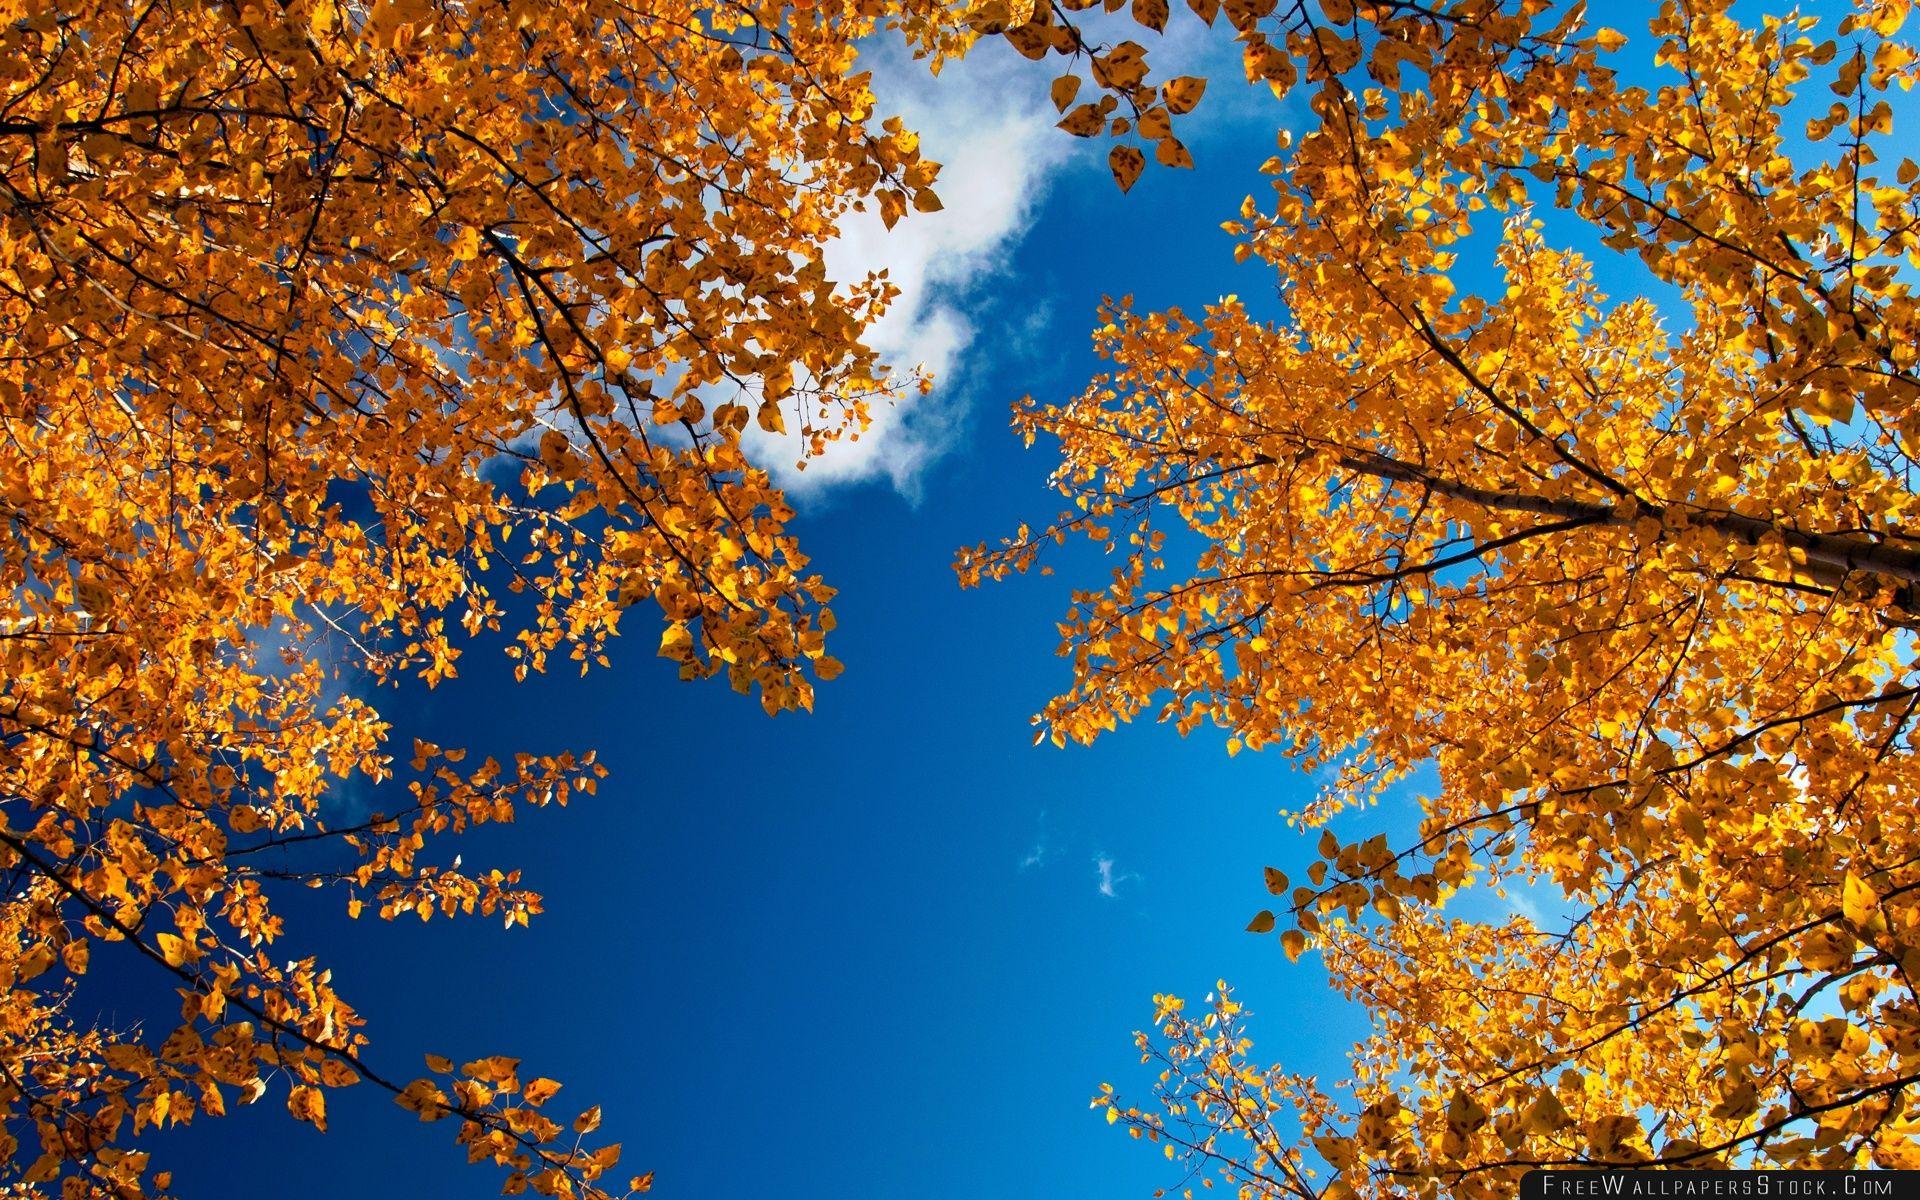 Download Free Wallpaper Yellow Autumn Trees